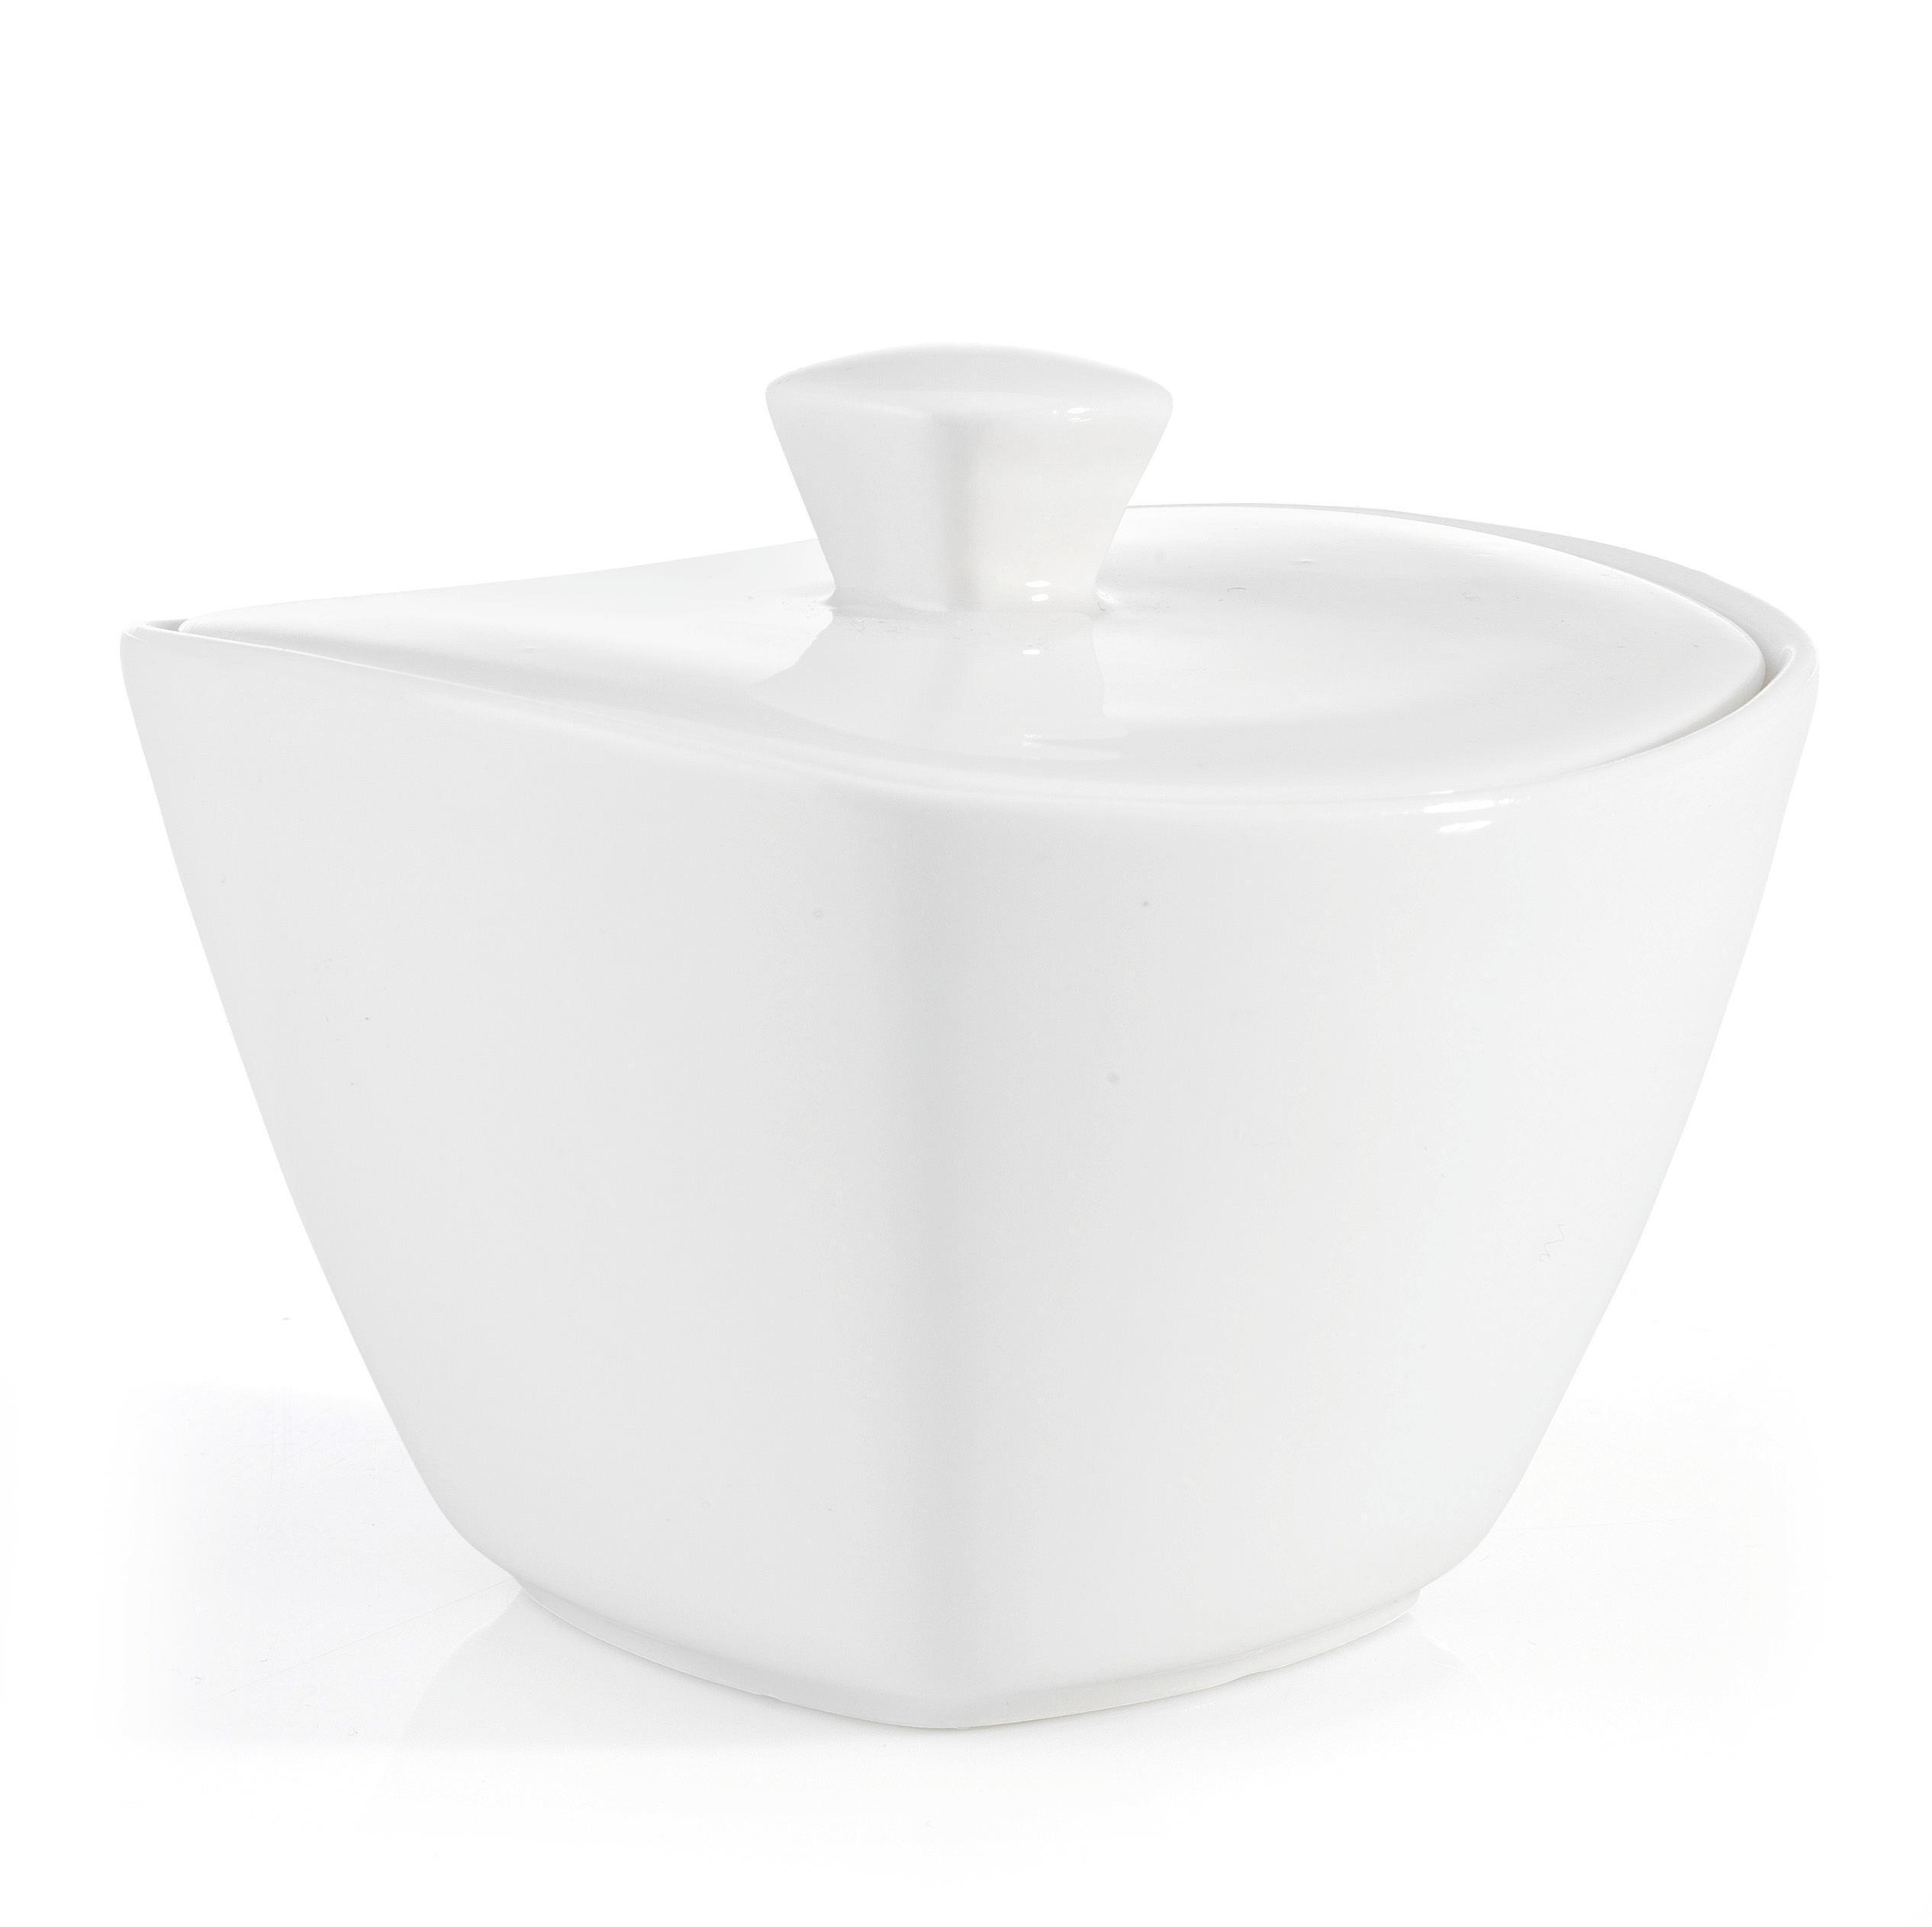 Posoda Za Sladkor Tacoma - bela, Trendi, keramika (11/7,4/11cm) - premium living